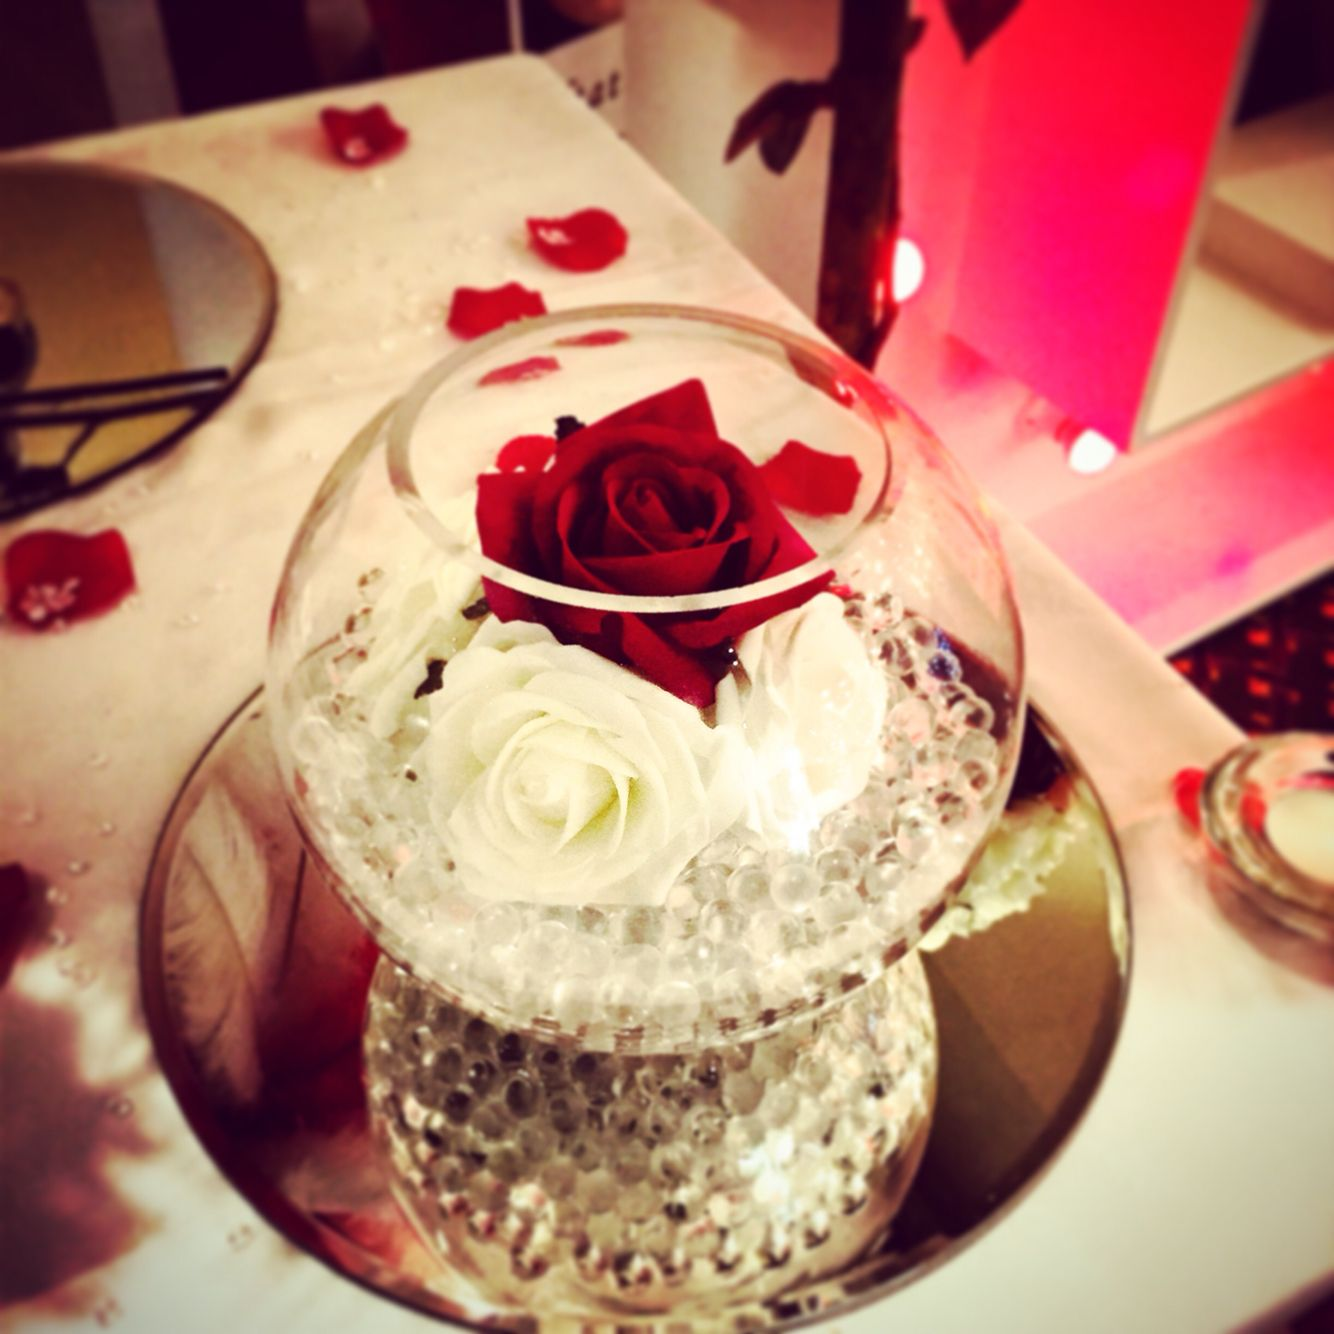 Fish Bowl And Roses …